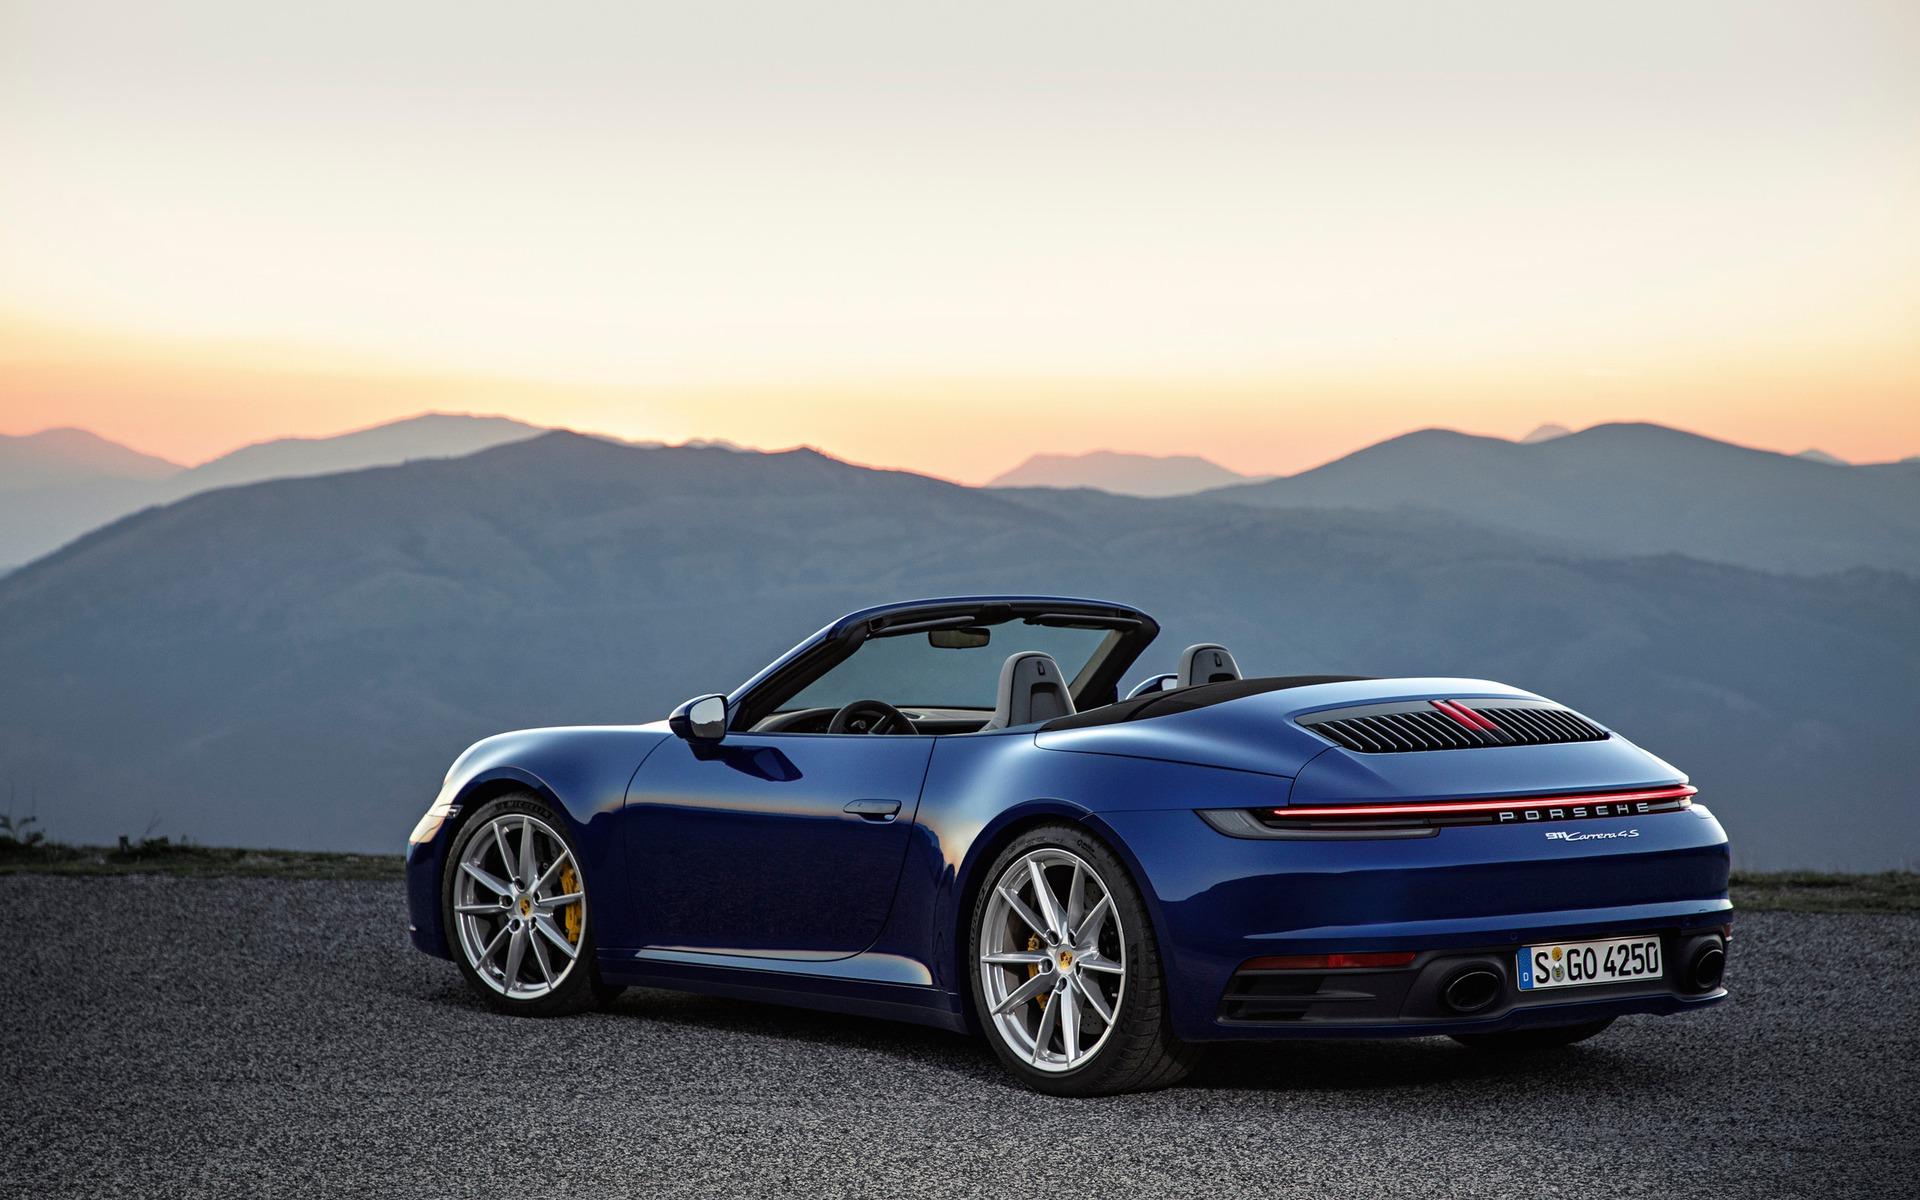 Voici la Porsche 911 Carrera Cabriolet 2020 362245_2020_Porsche_911